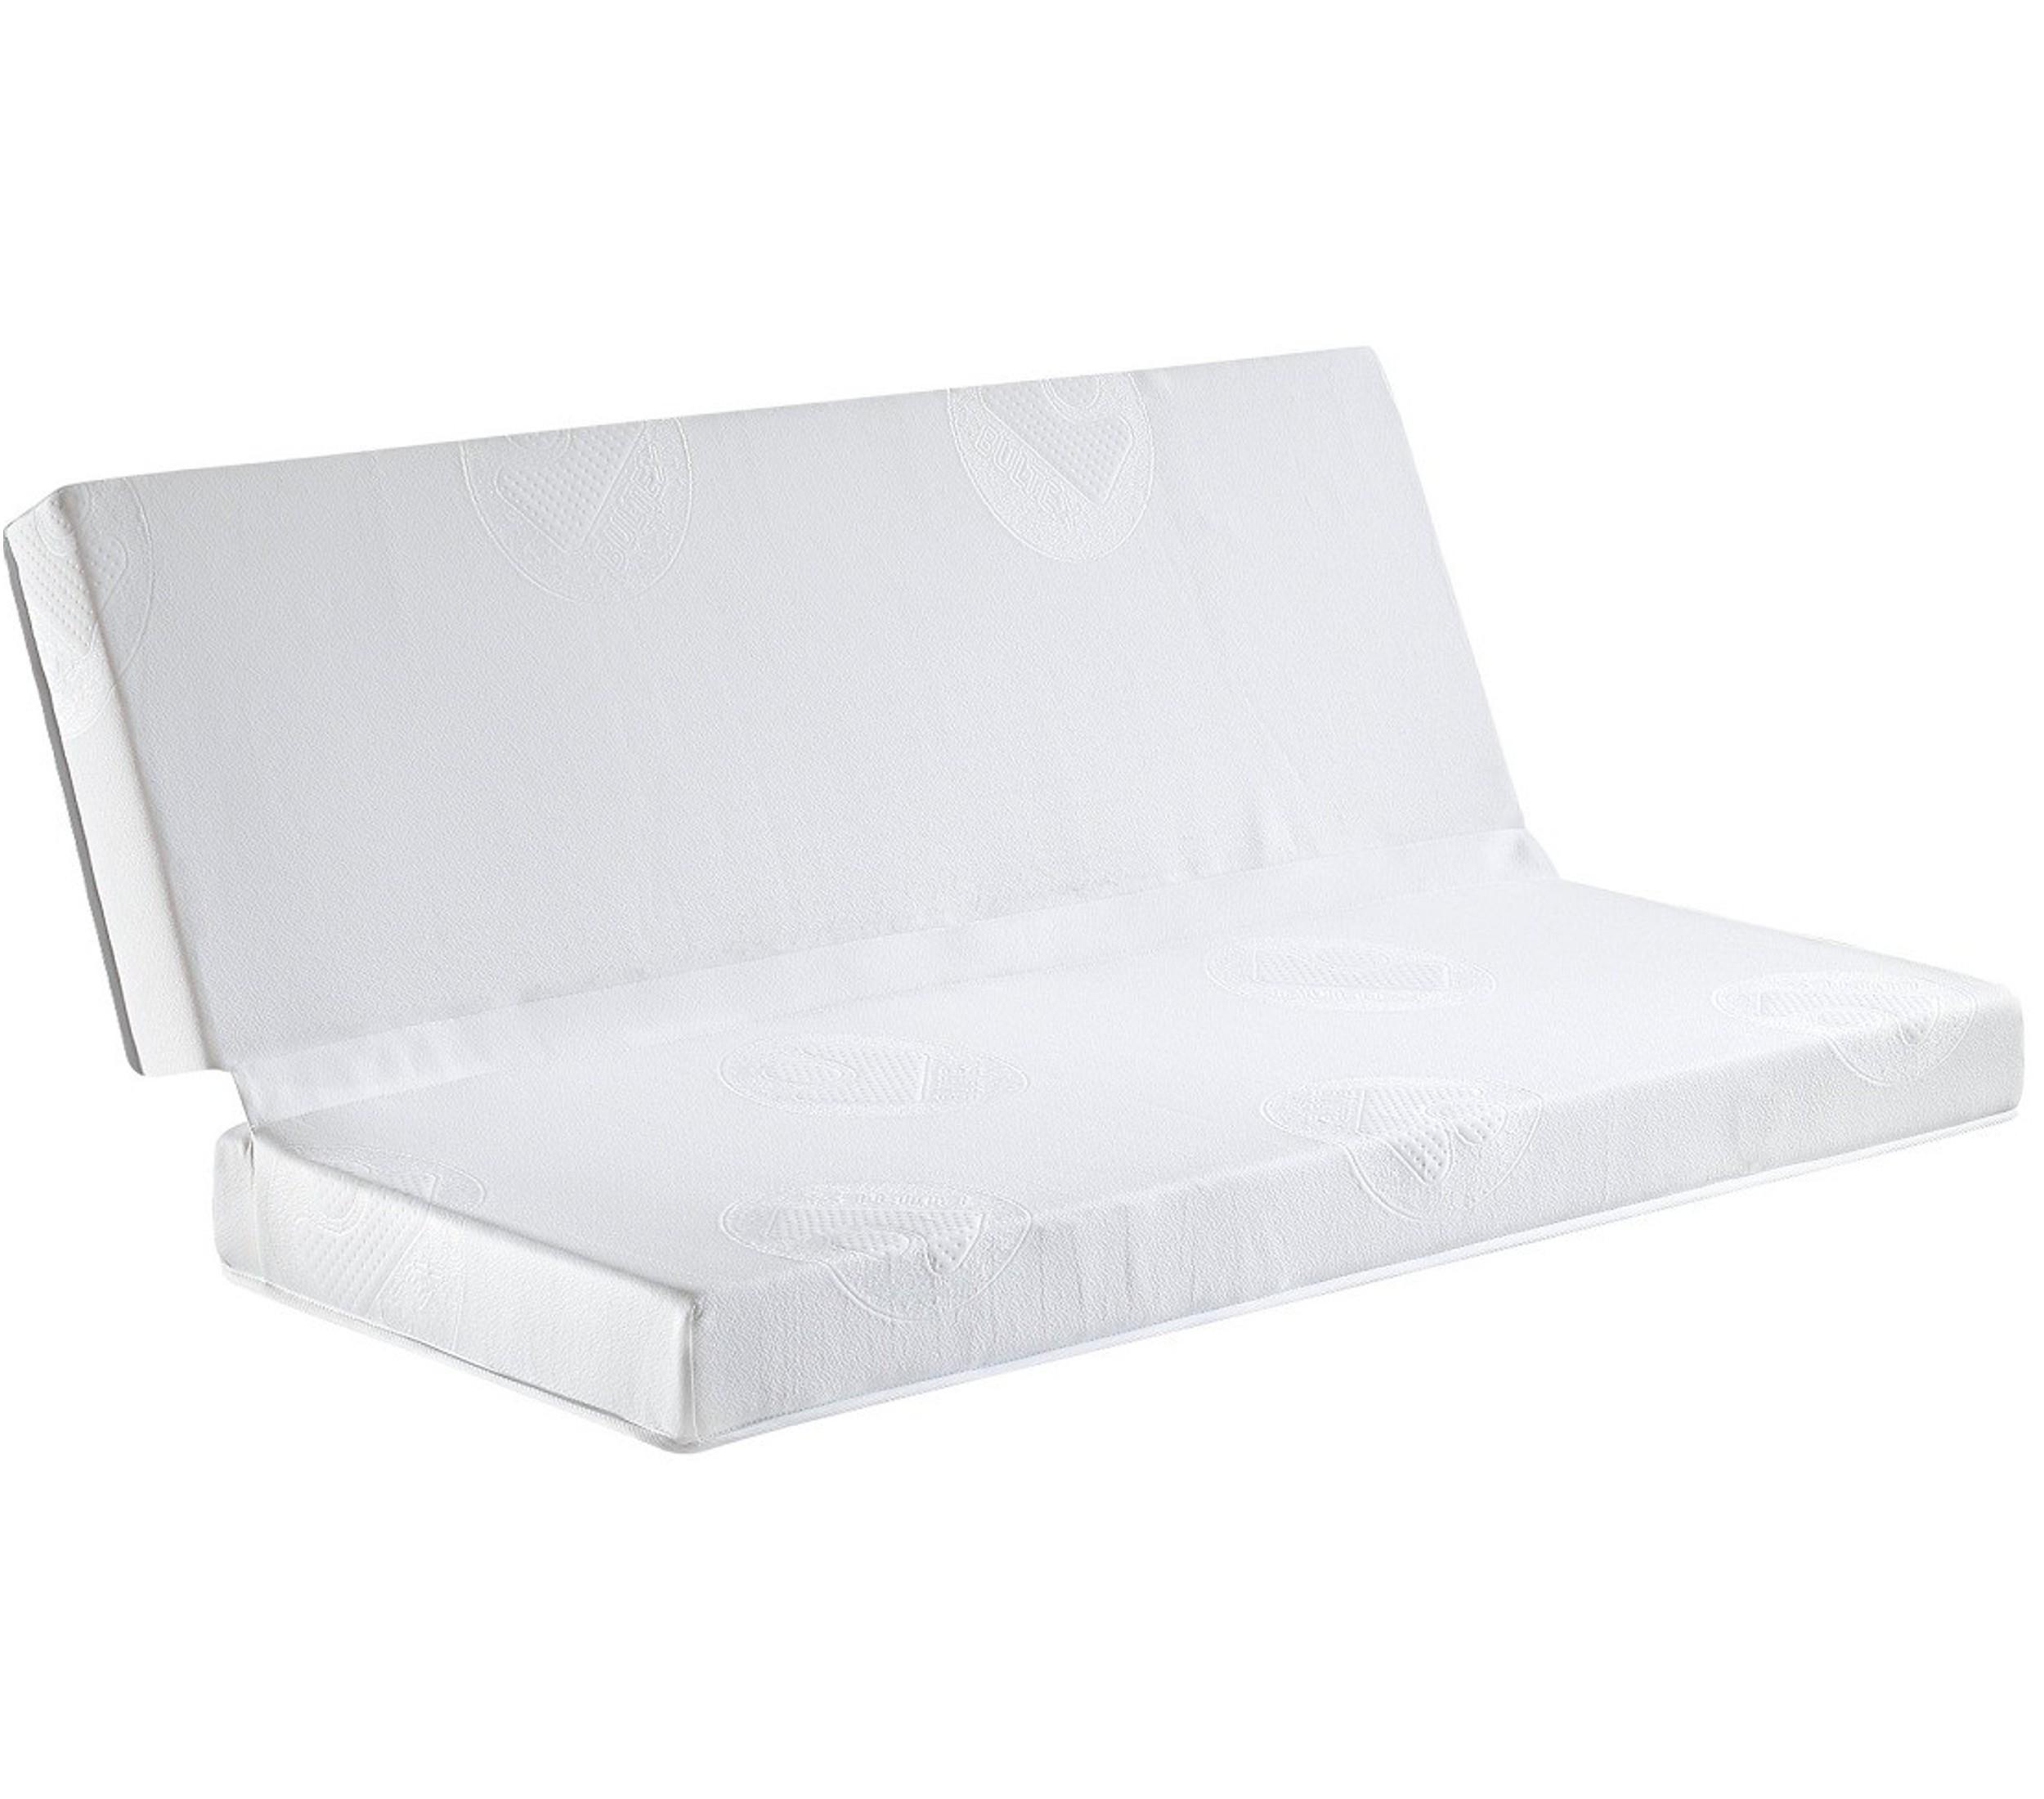 Canapé Convertible Confortable Bultex Beau Stock Clic Clac Matelas Bultex Ides